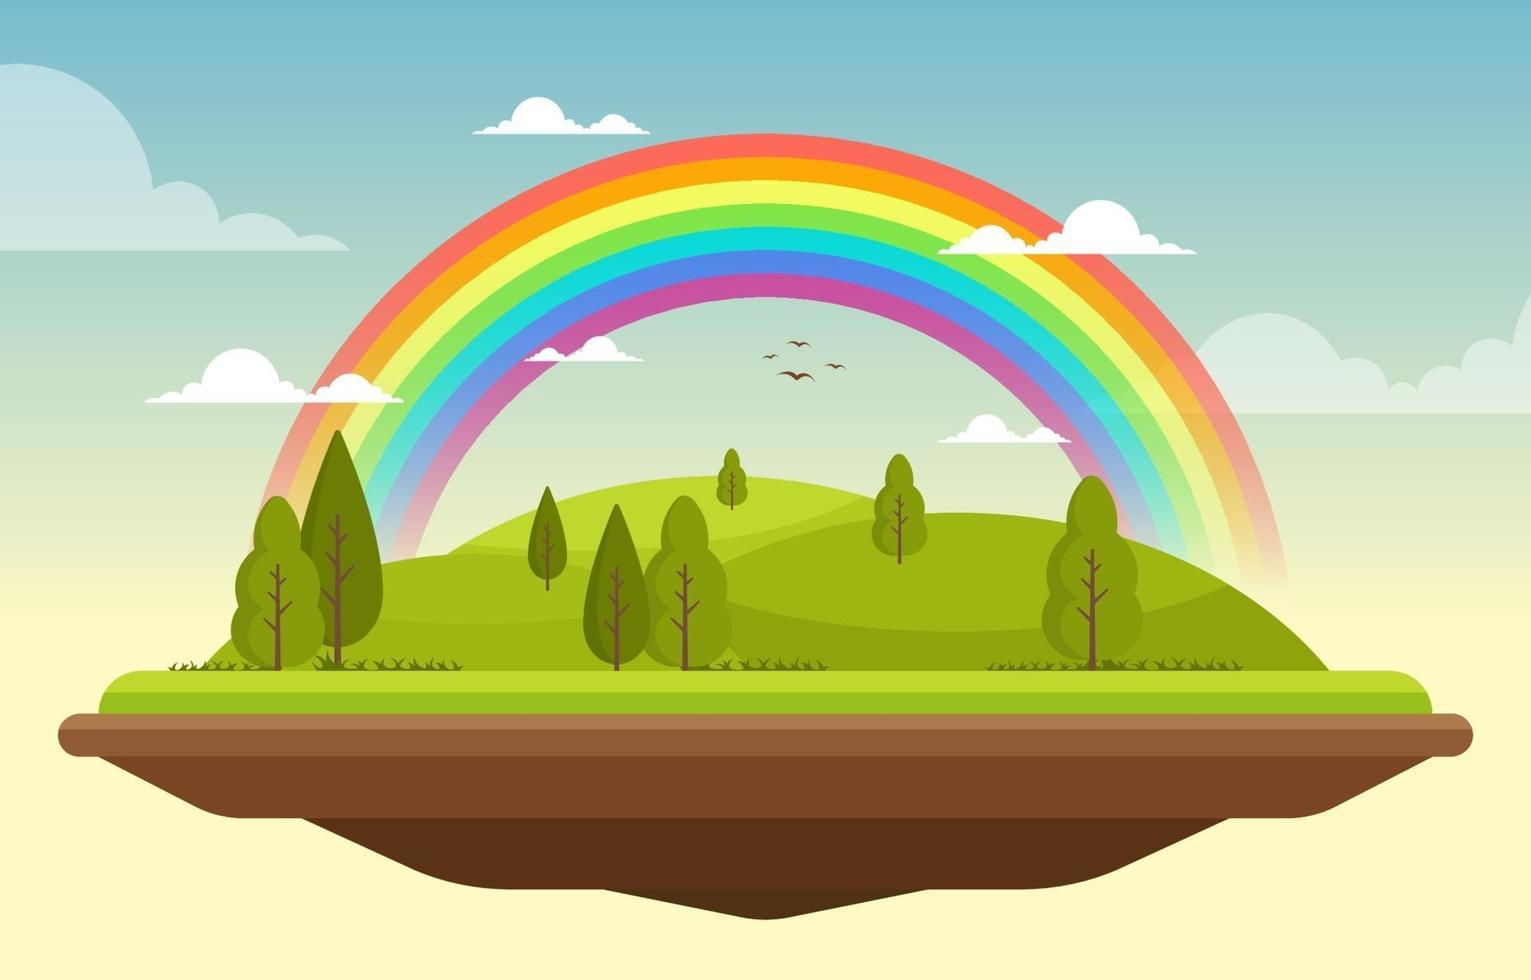 schöne schwimmende Landschaft Regenbogen Sommer Natur Illustration vektor